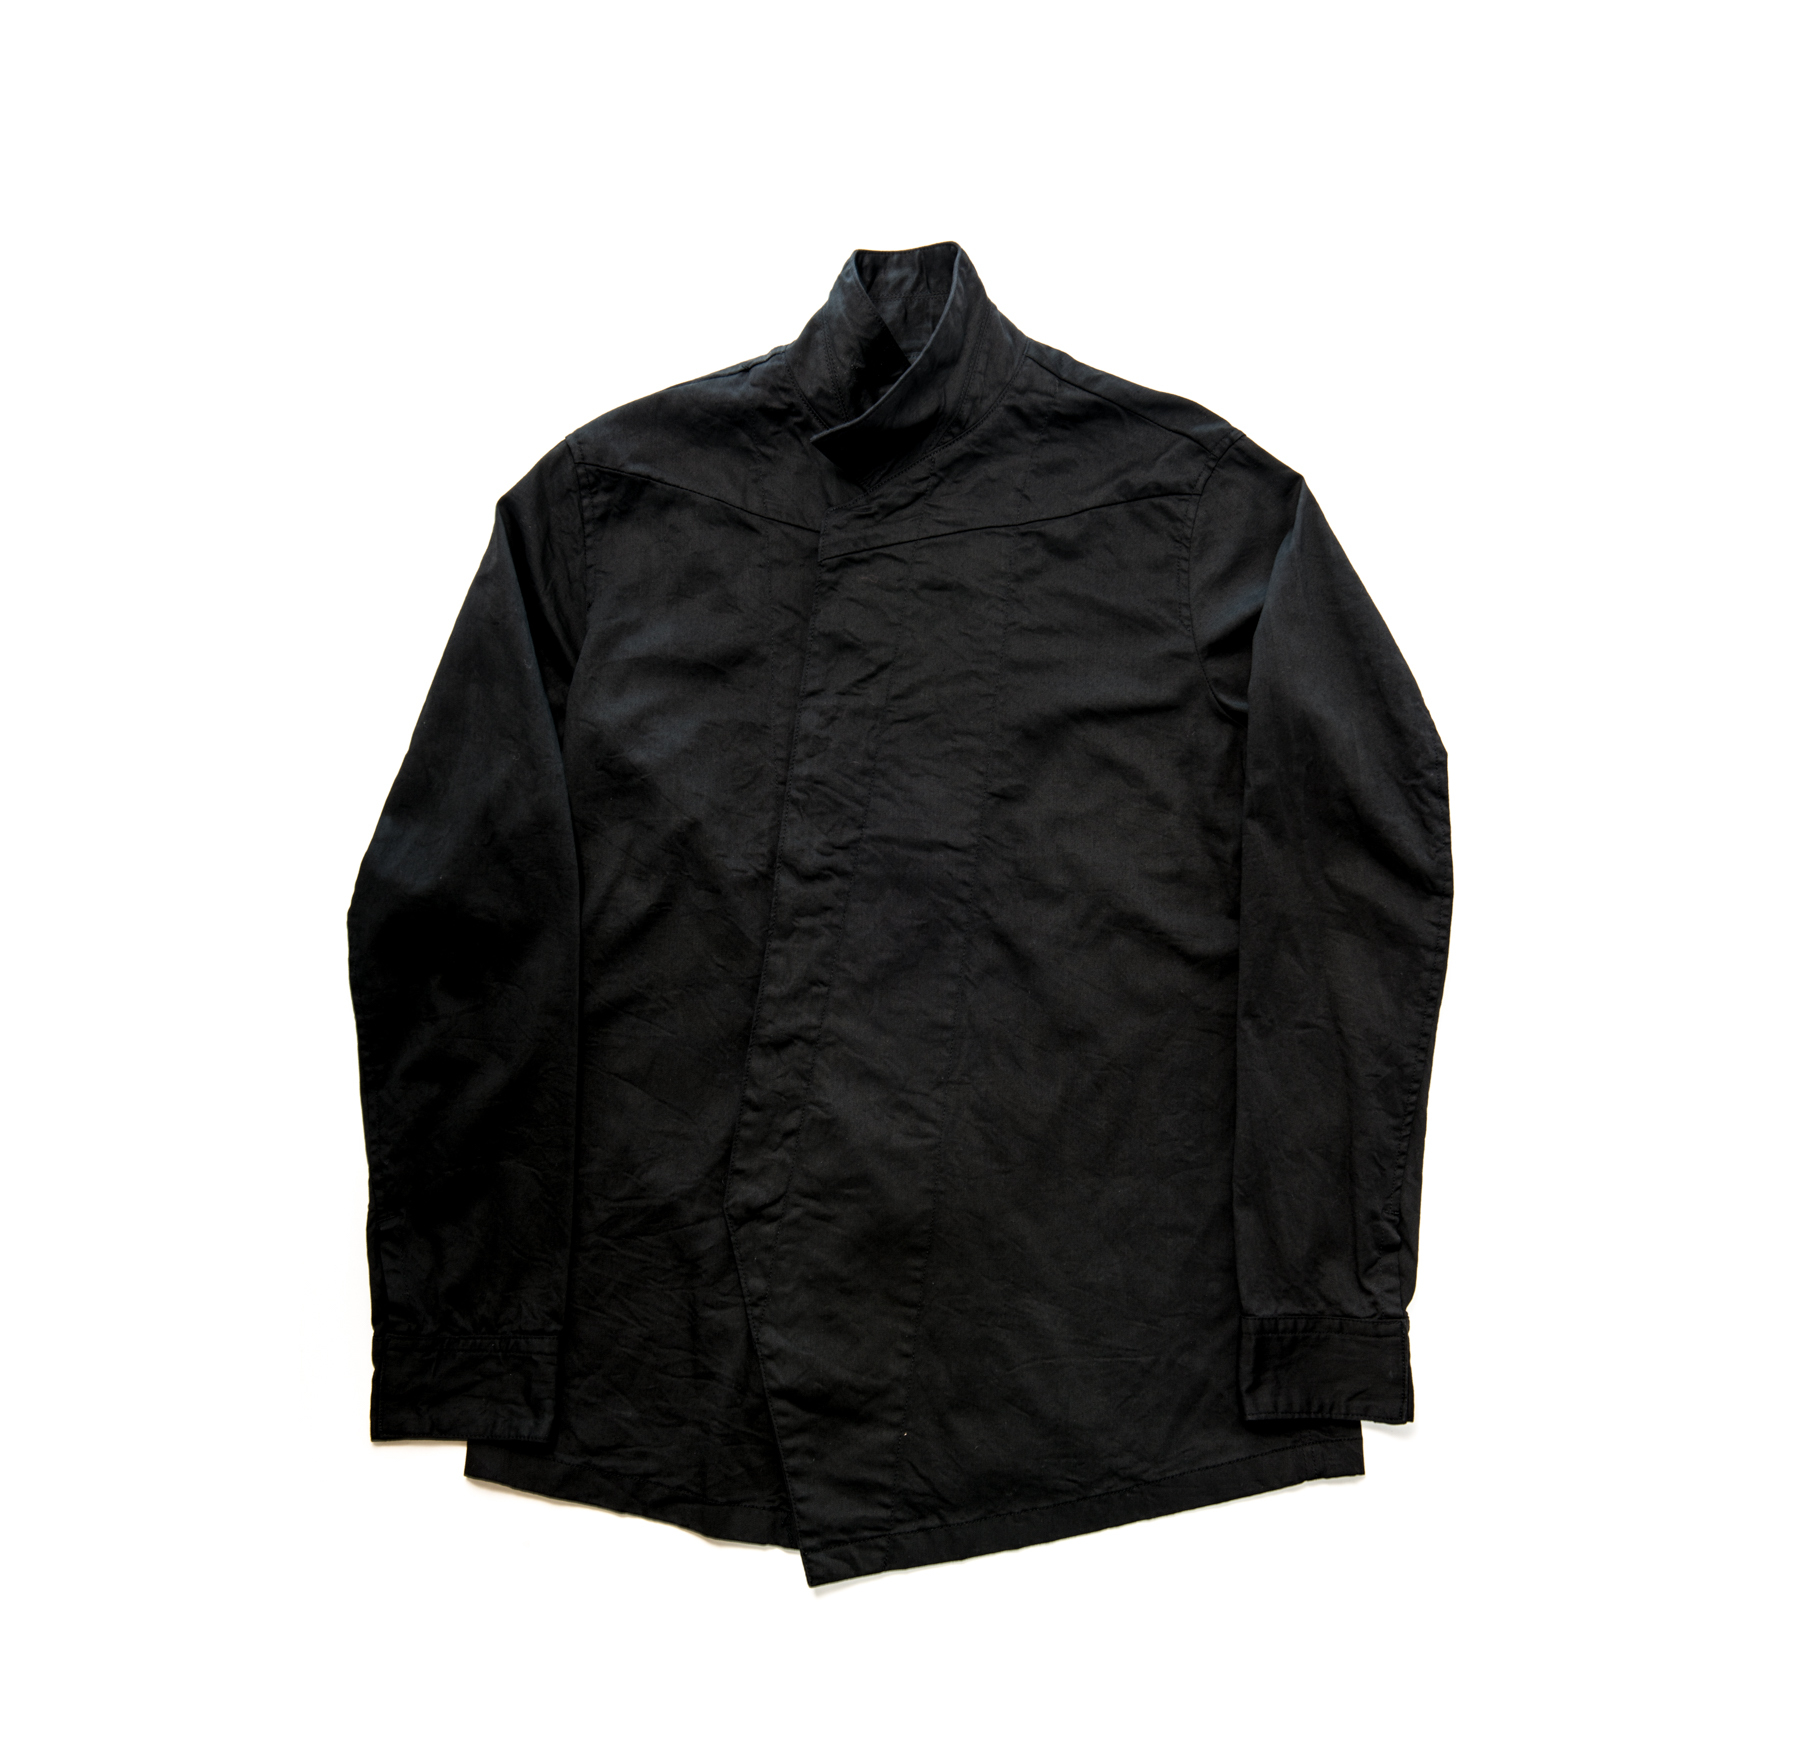 587BLM2-BLACK / スタンドカラーシャツジャケット